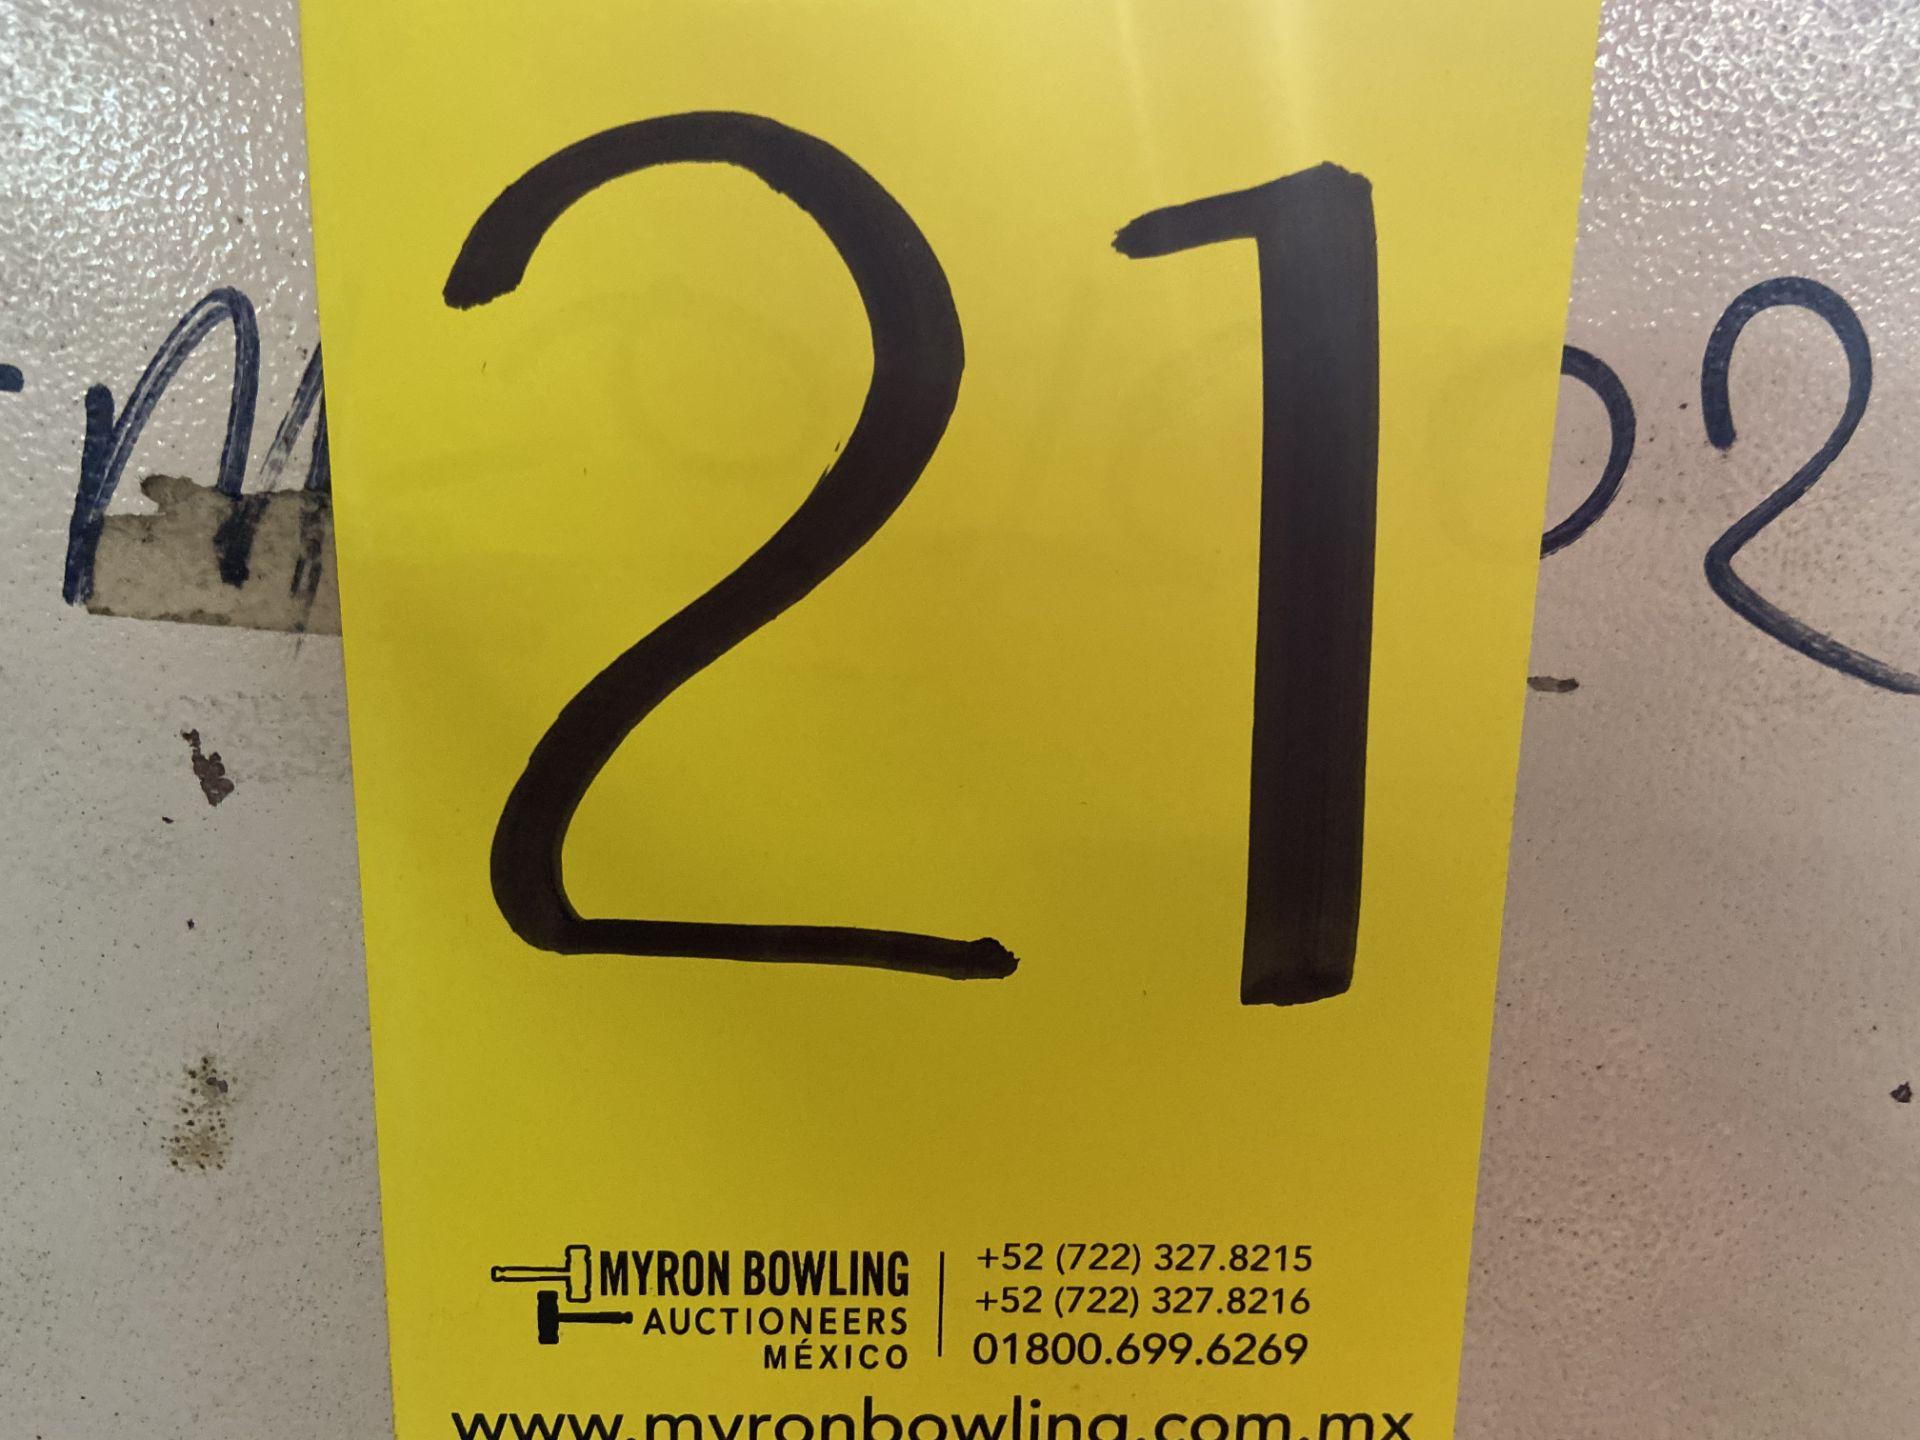 Lot 21 - Prensa de grommet marca Dah Jiuh Enterprise, Modelo: DJ-1036